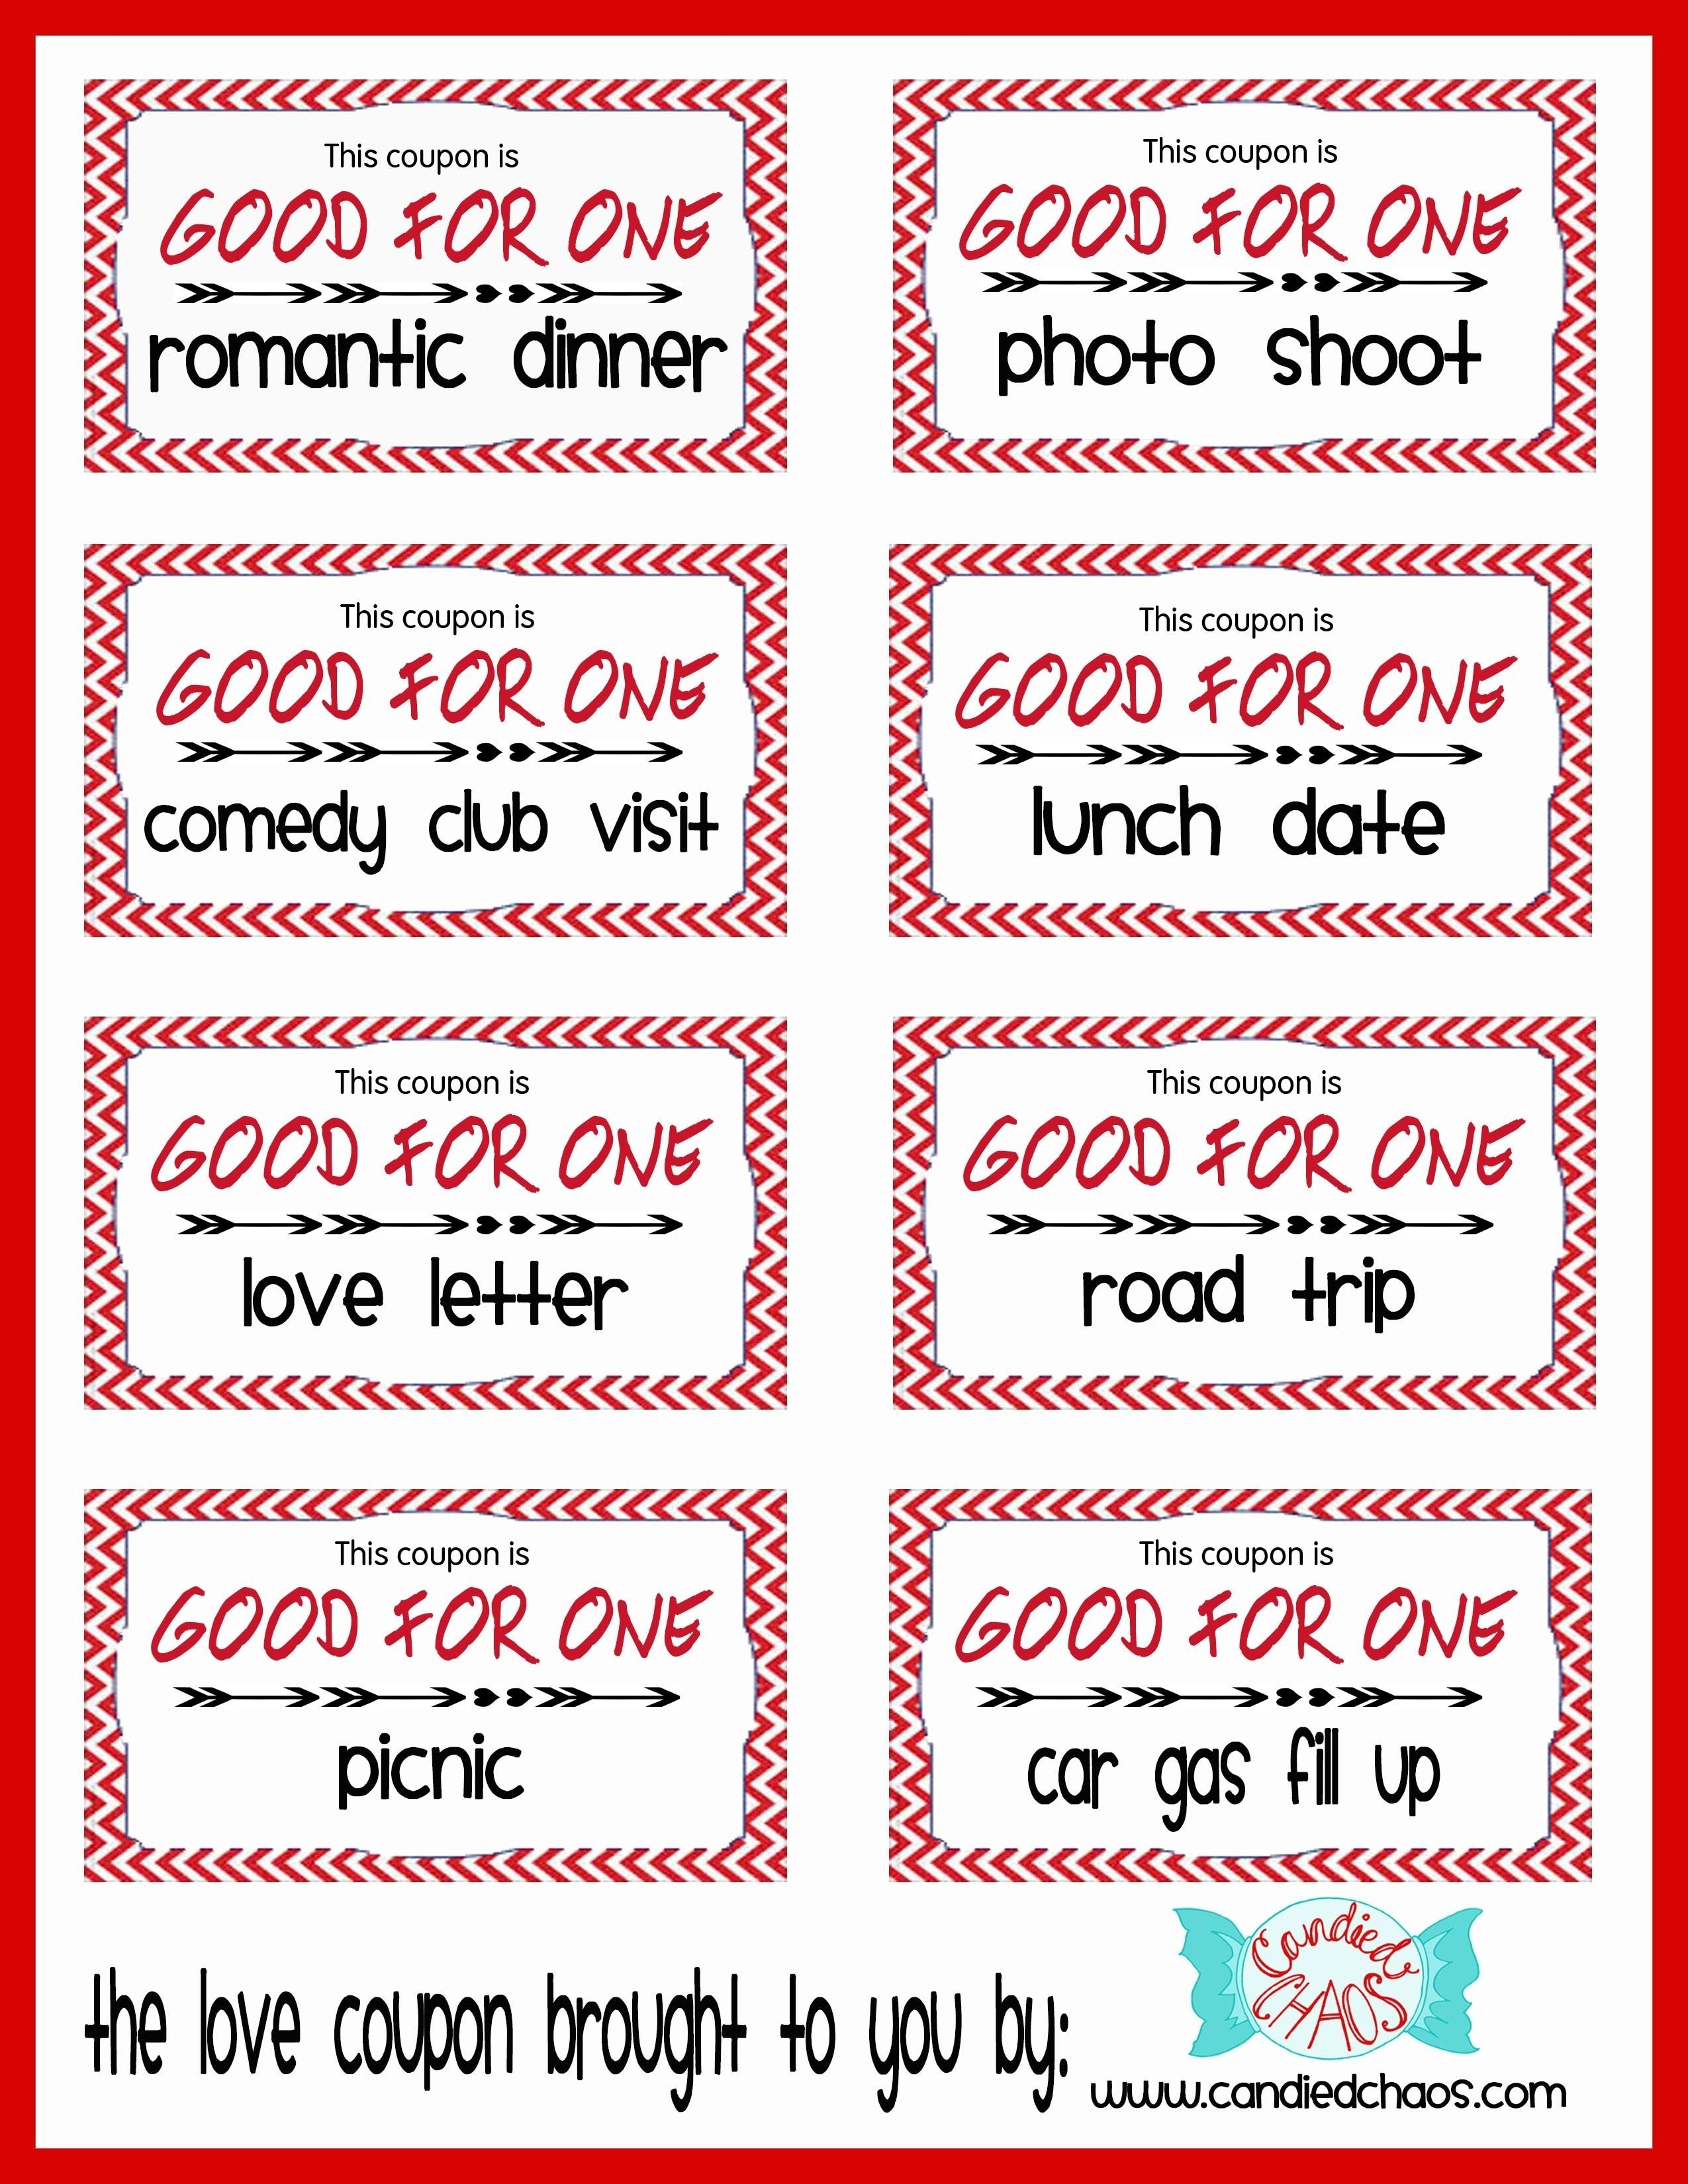 10 Great Coupon Book Ideas For Boyfriend couponpg2 2550x3300 pixels crafty shiz pinterest 2020